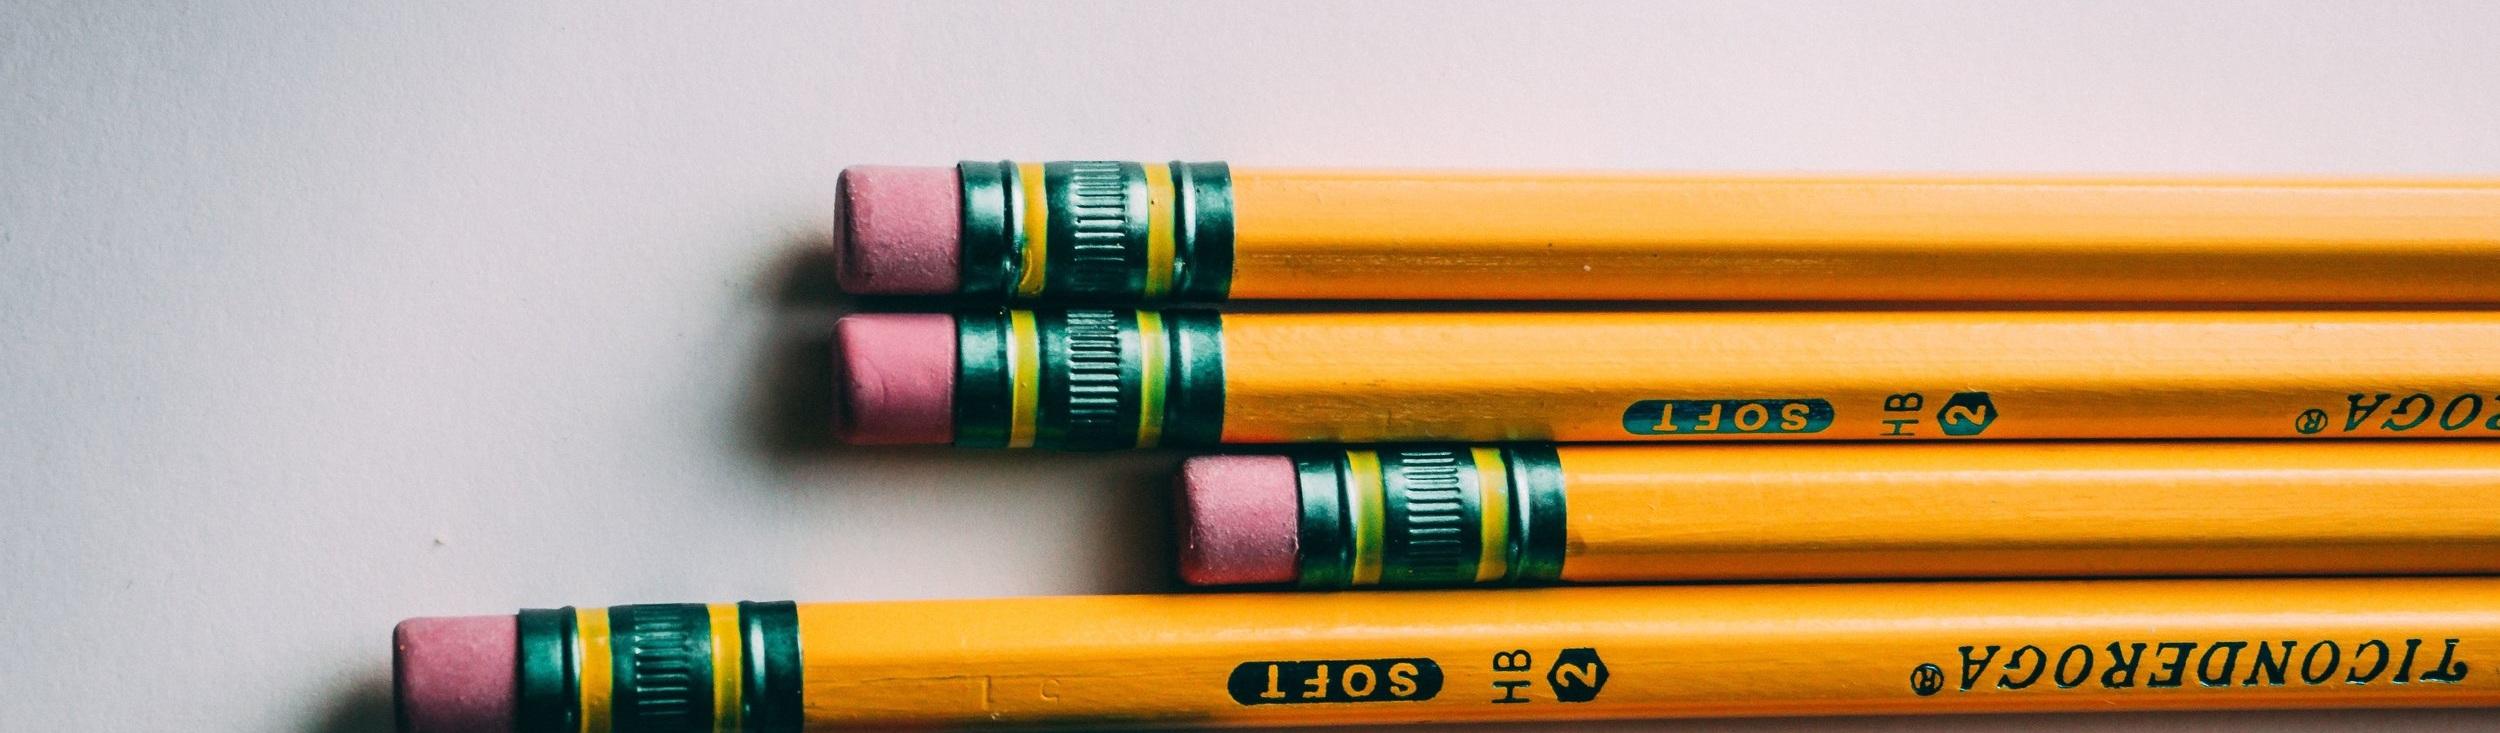 Pencils+Side.jpg